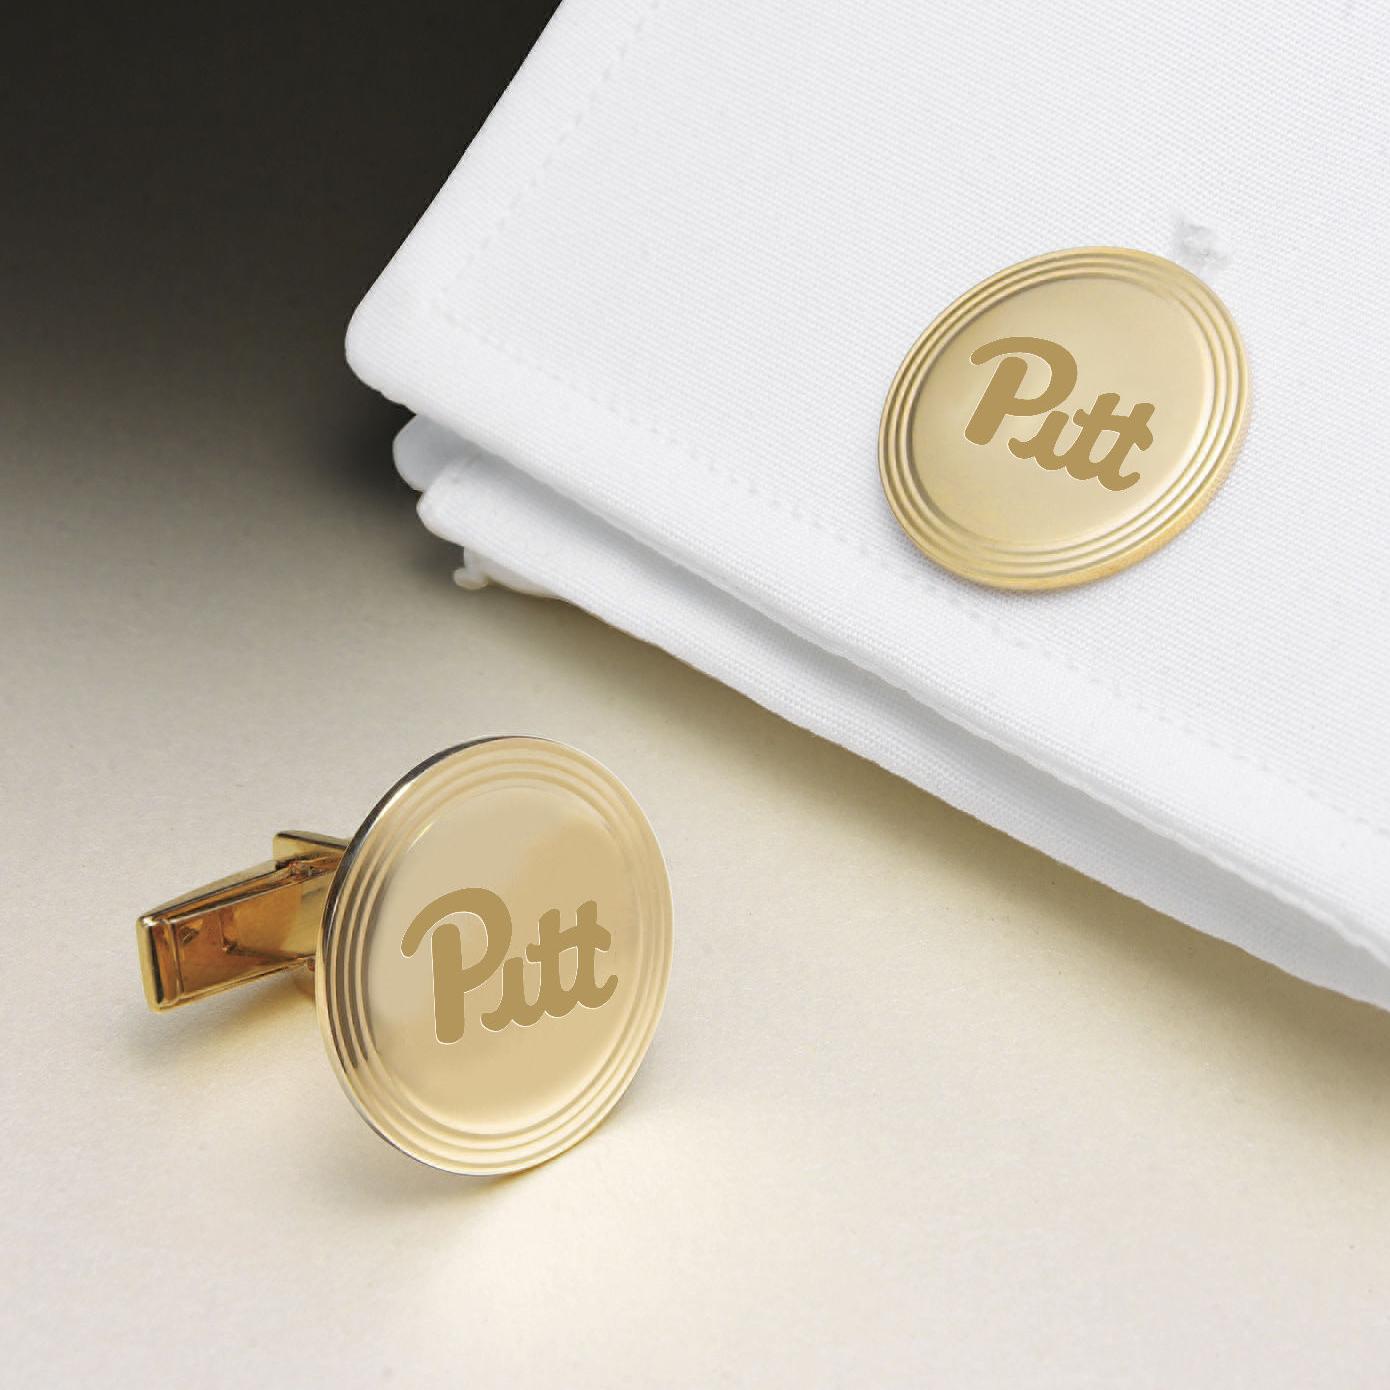 Pittsburgh 18K Gold Cufflinks